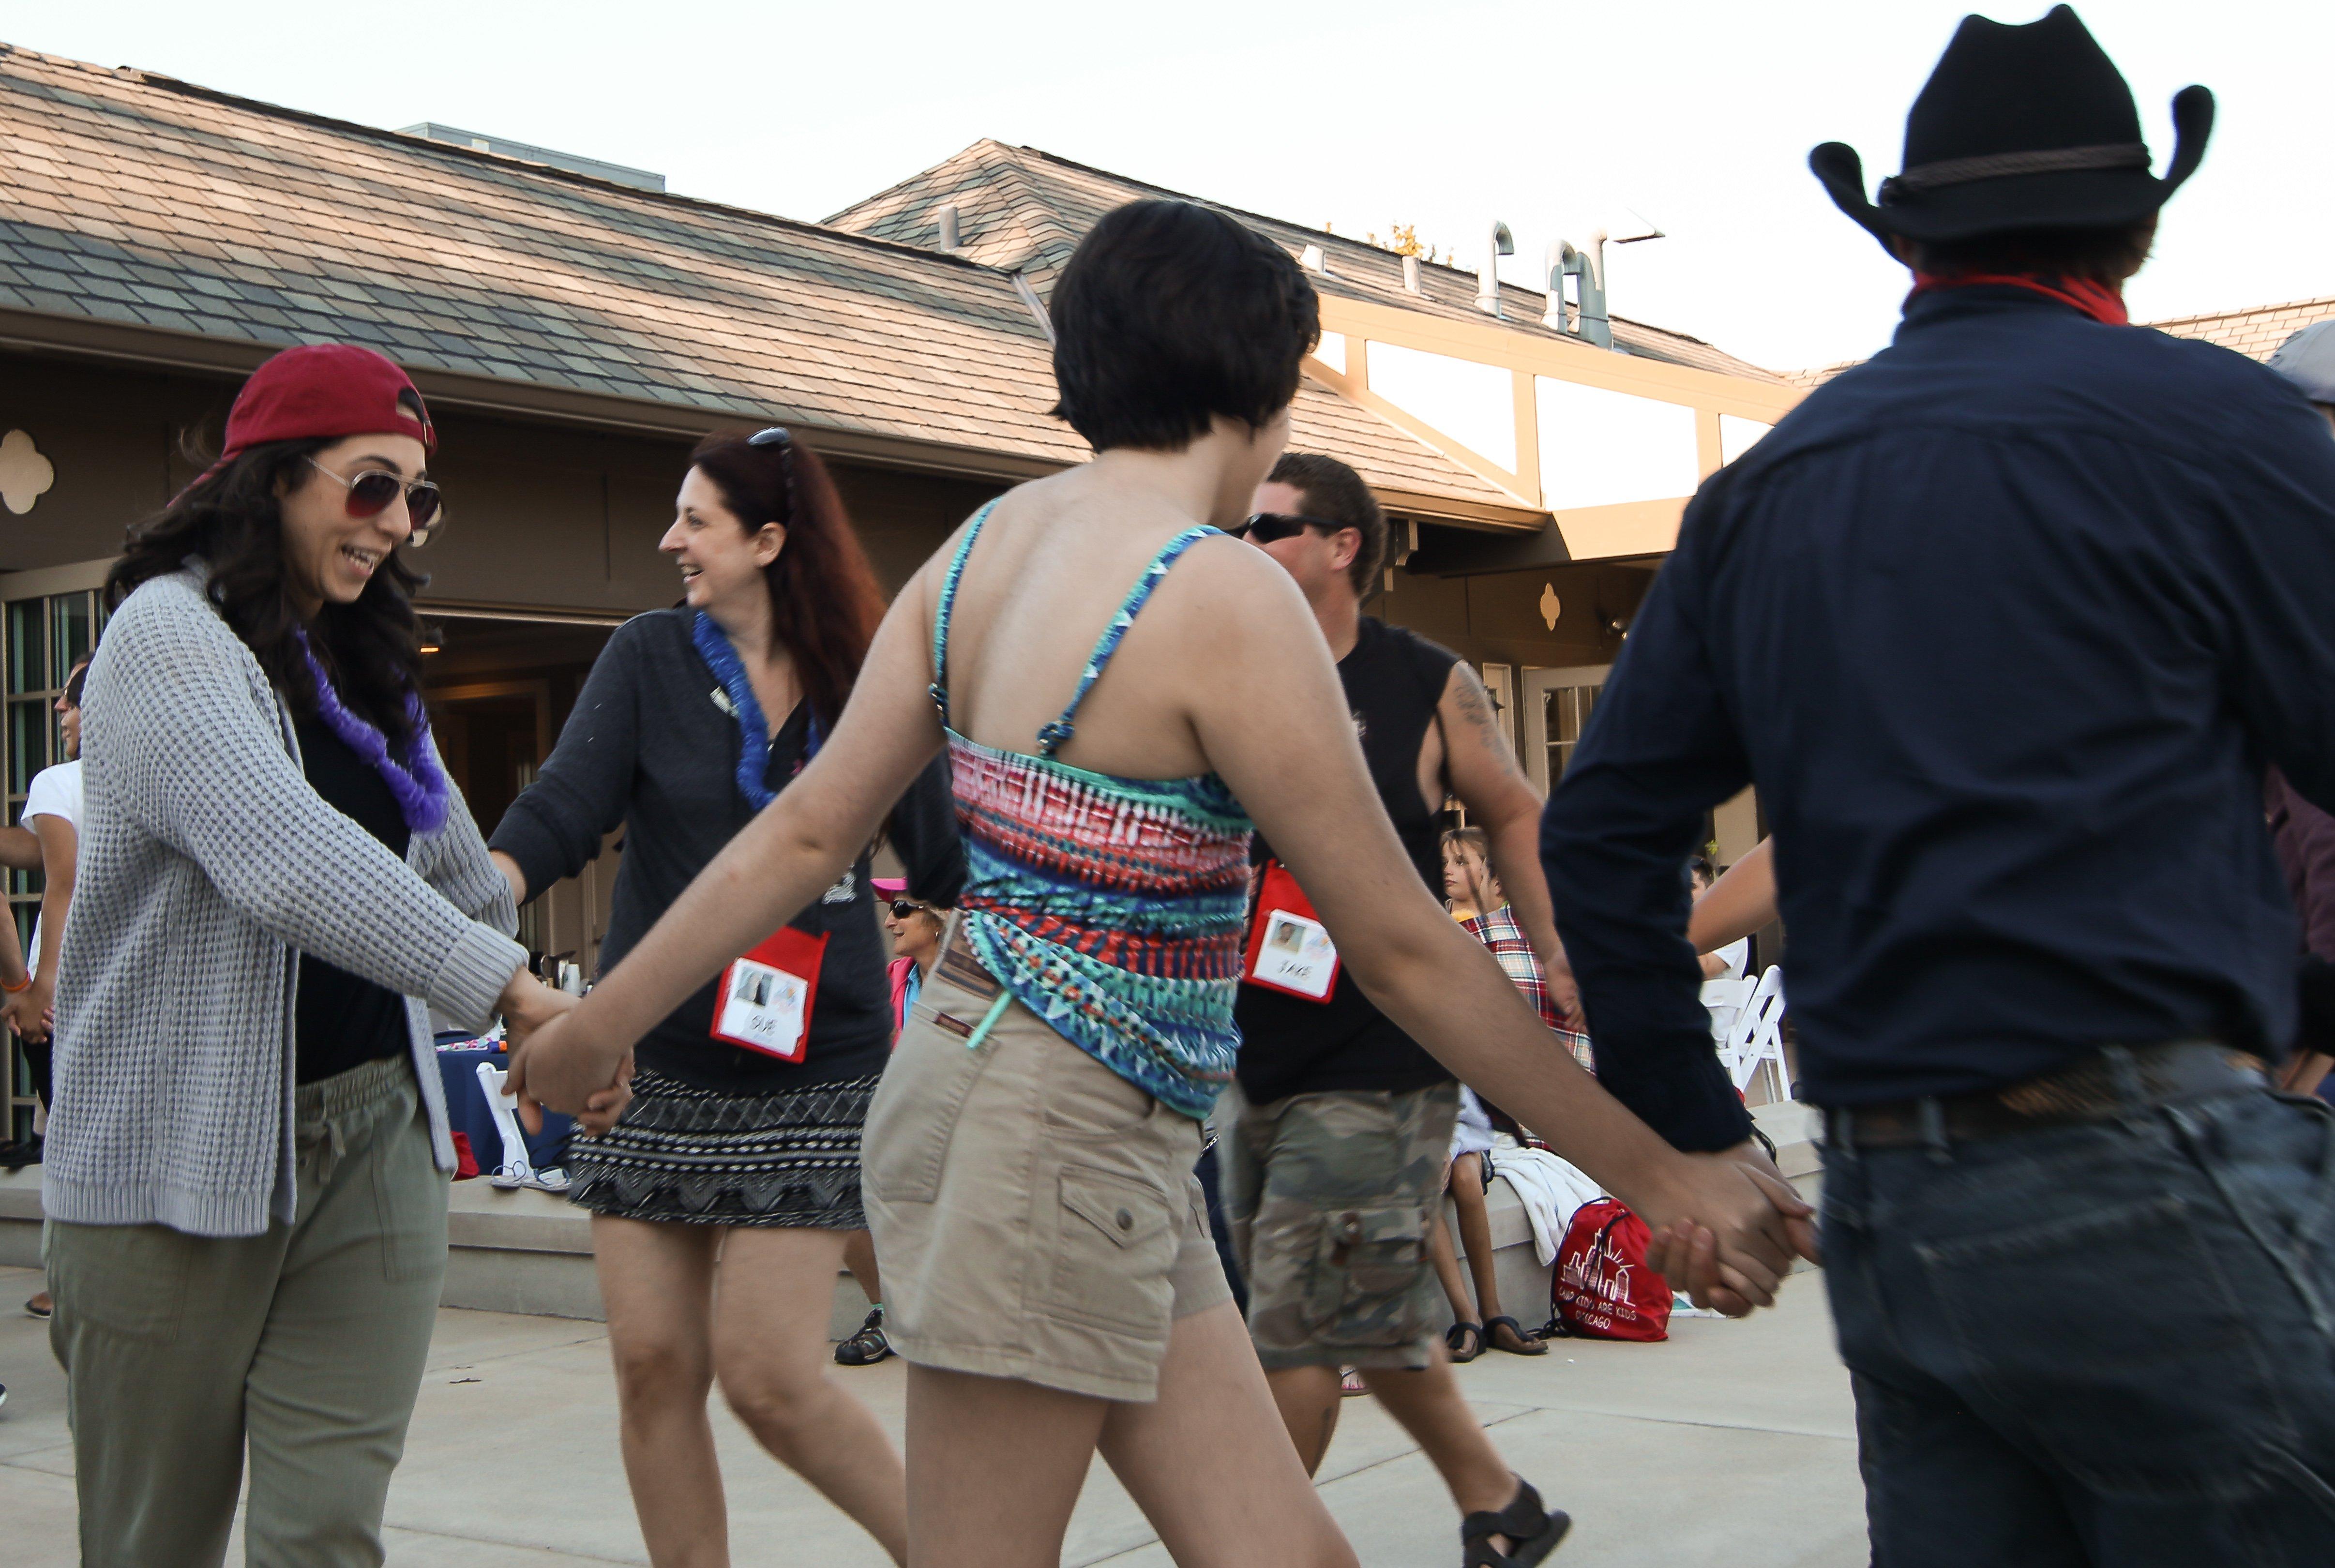 https://campkidsarekids.org/wp-content/uploads/2018/07/Evanston-CC-Dancing-5.jpg